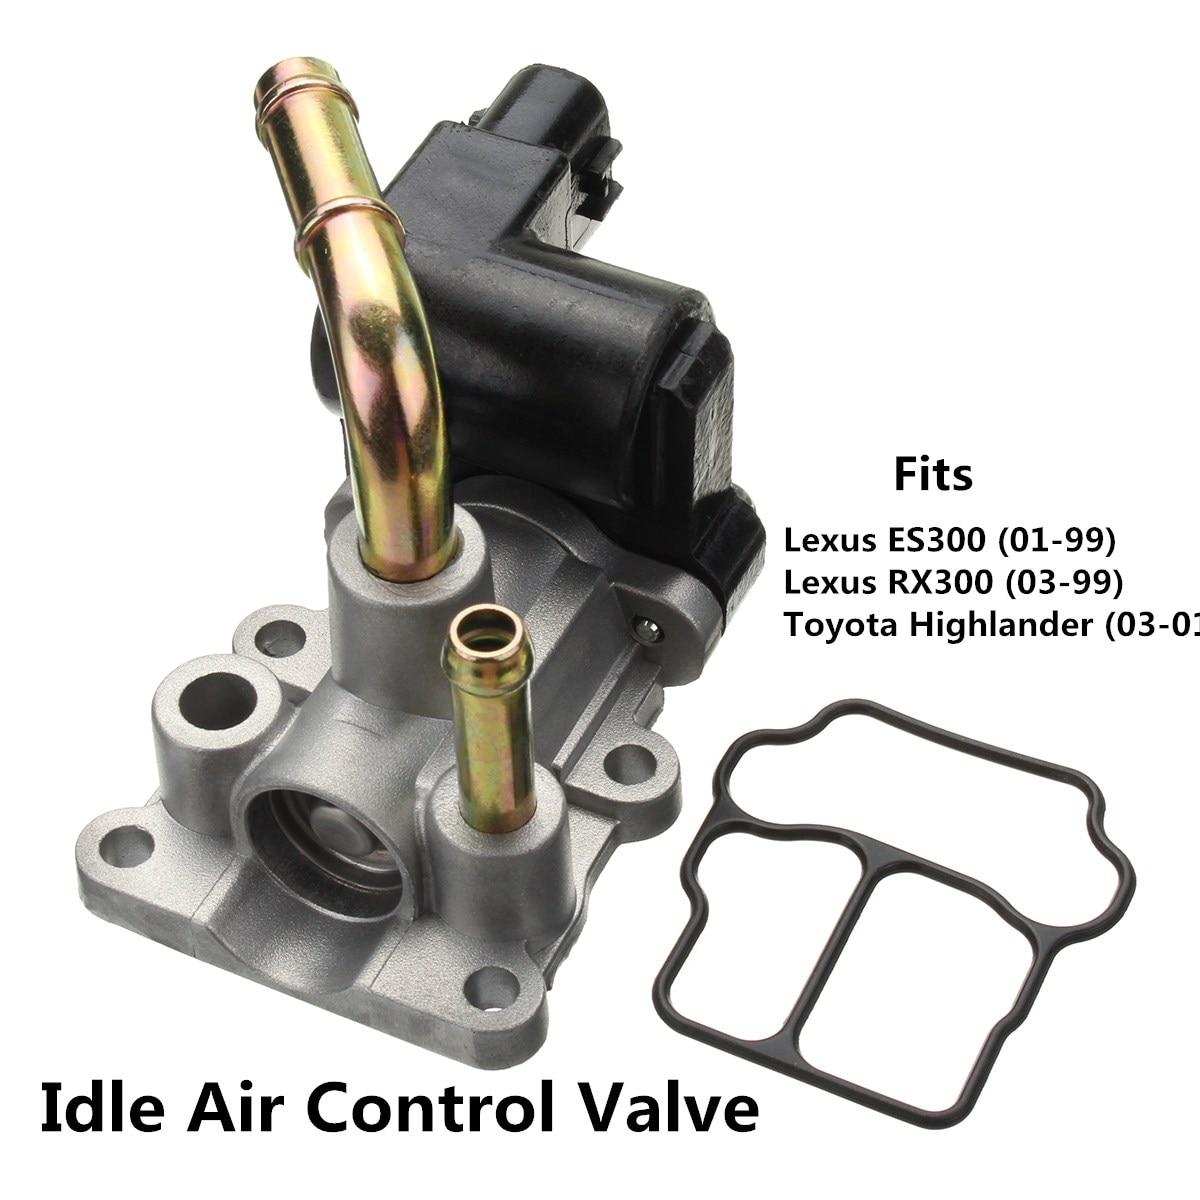 Idle Air Control Valve 2227020050 For Lexus ES300 RX300 Highlander 1999 2000 2001 2002 2003